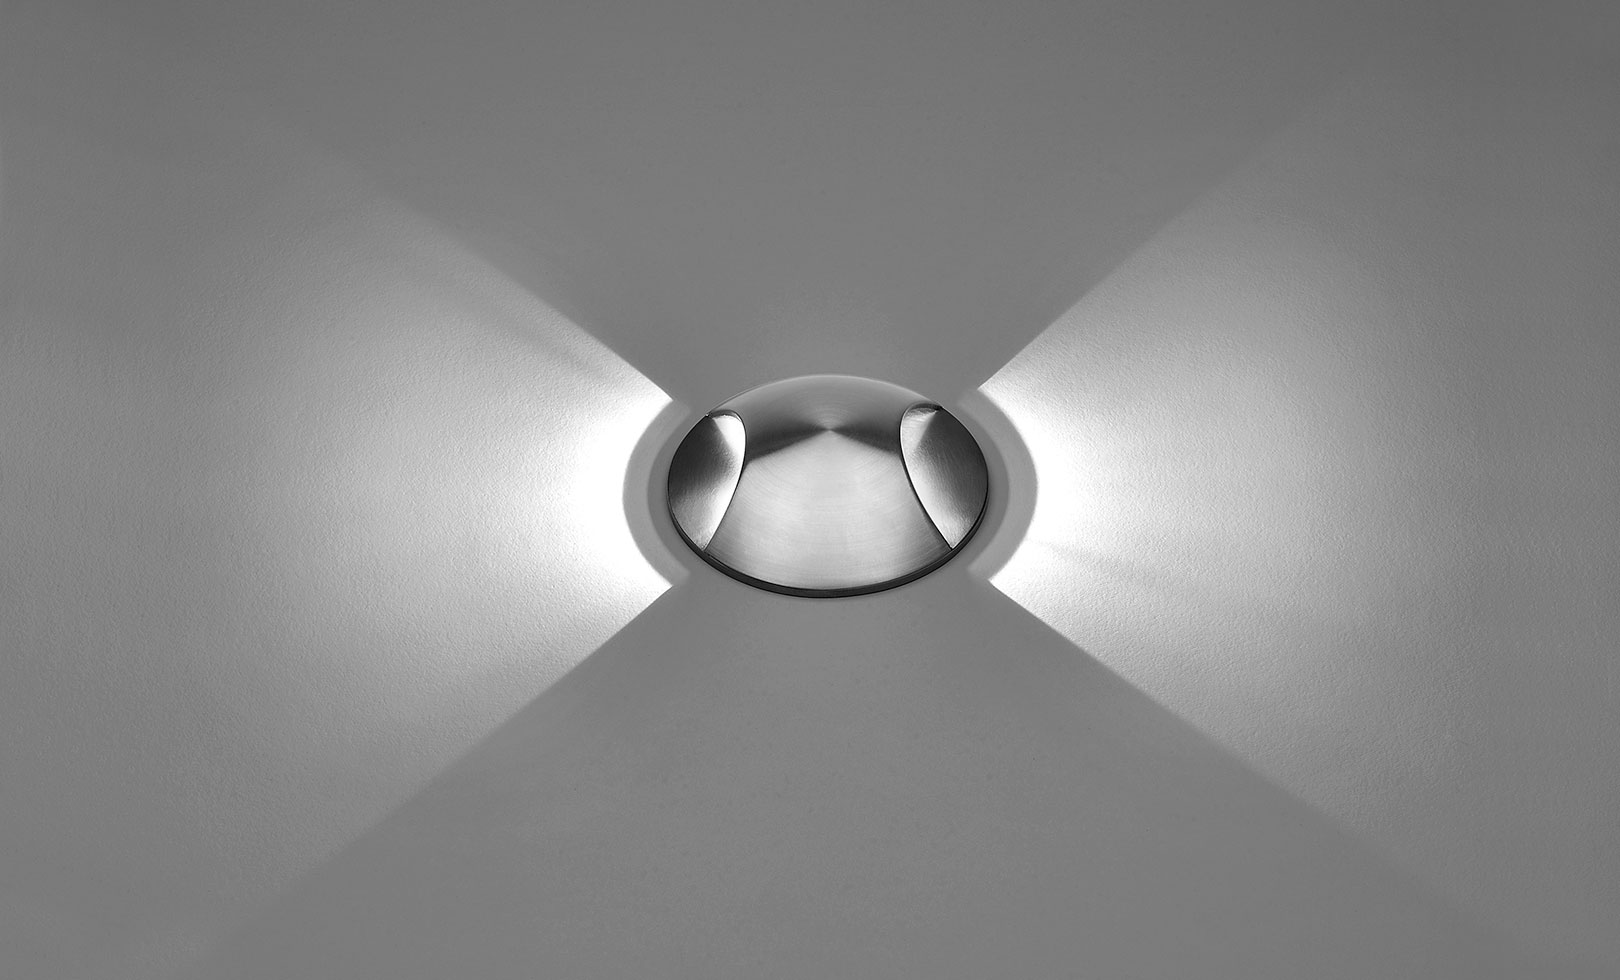 201066 HYDROFLOOR MICRO STEEL 02 LED 5W 1